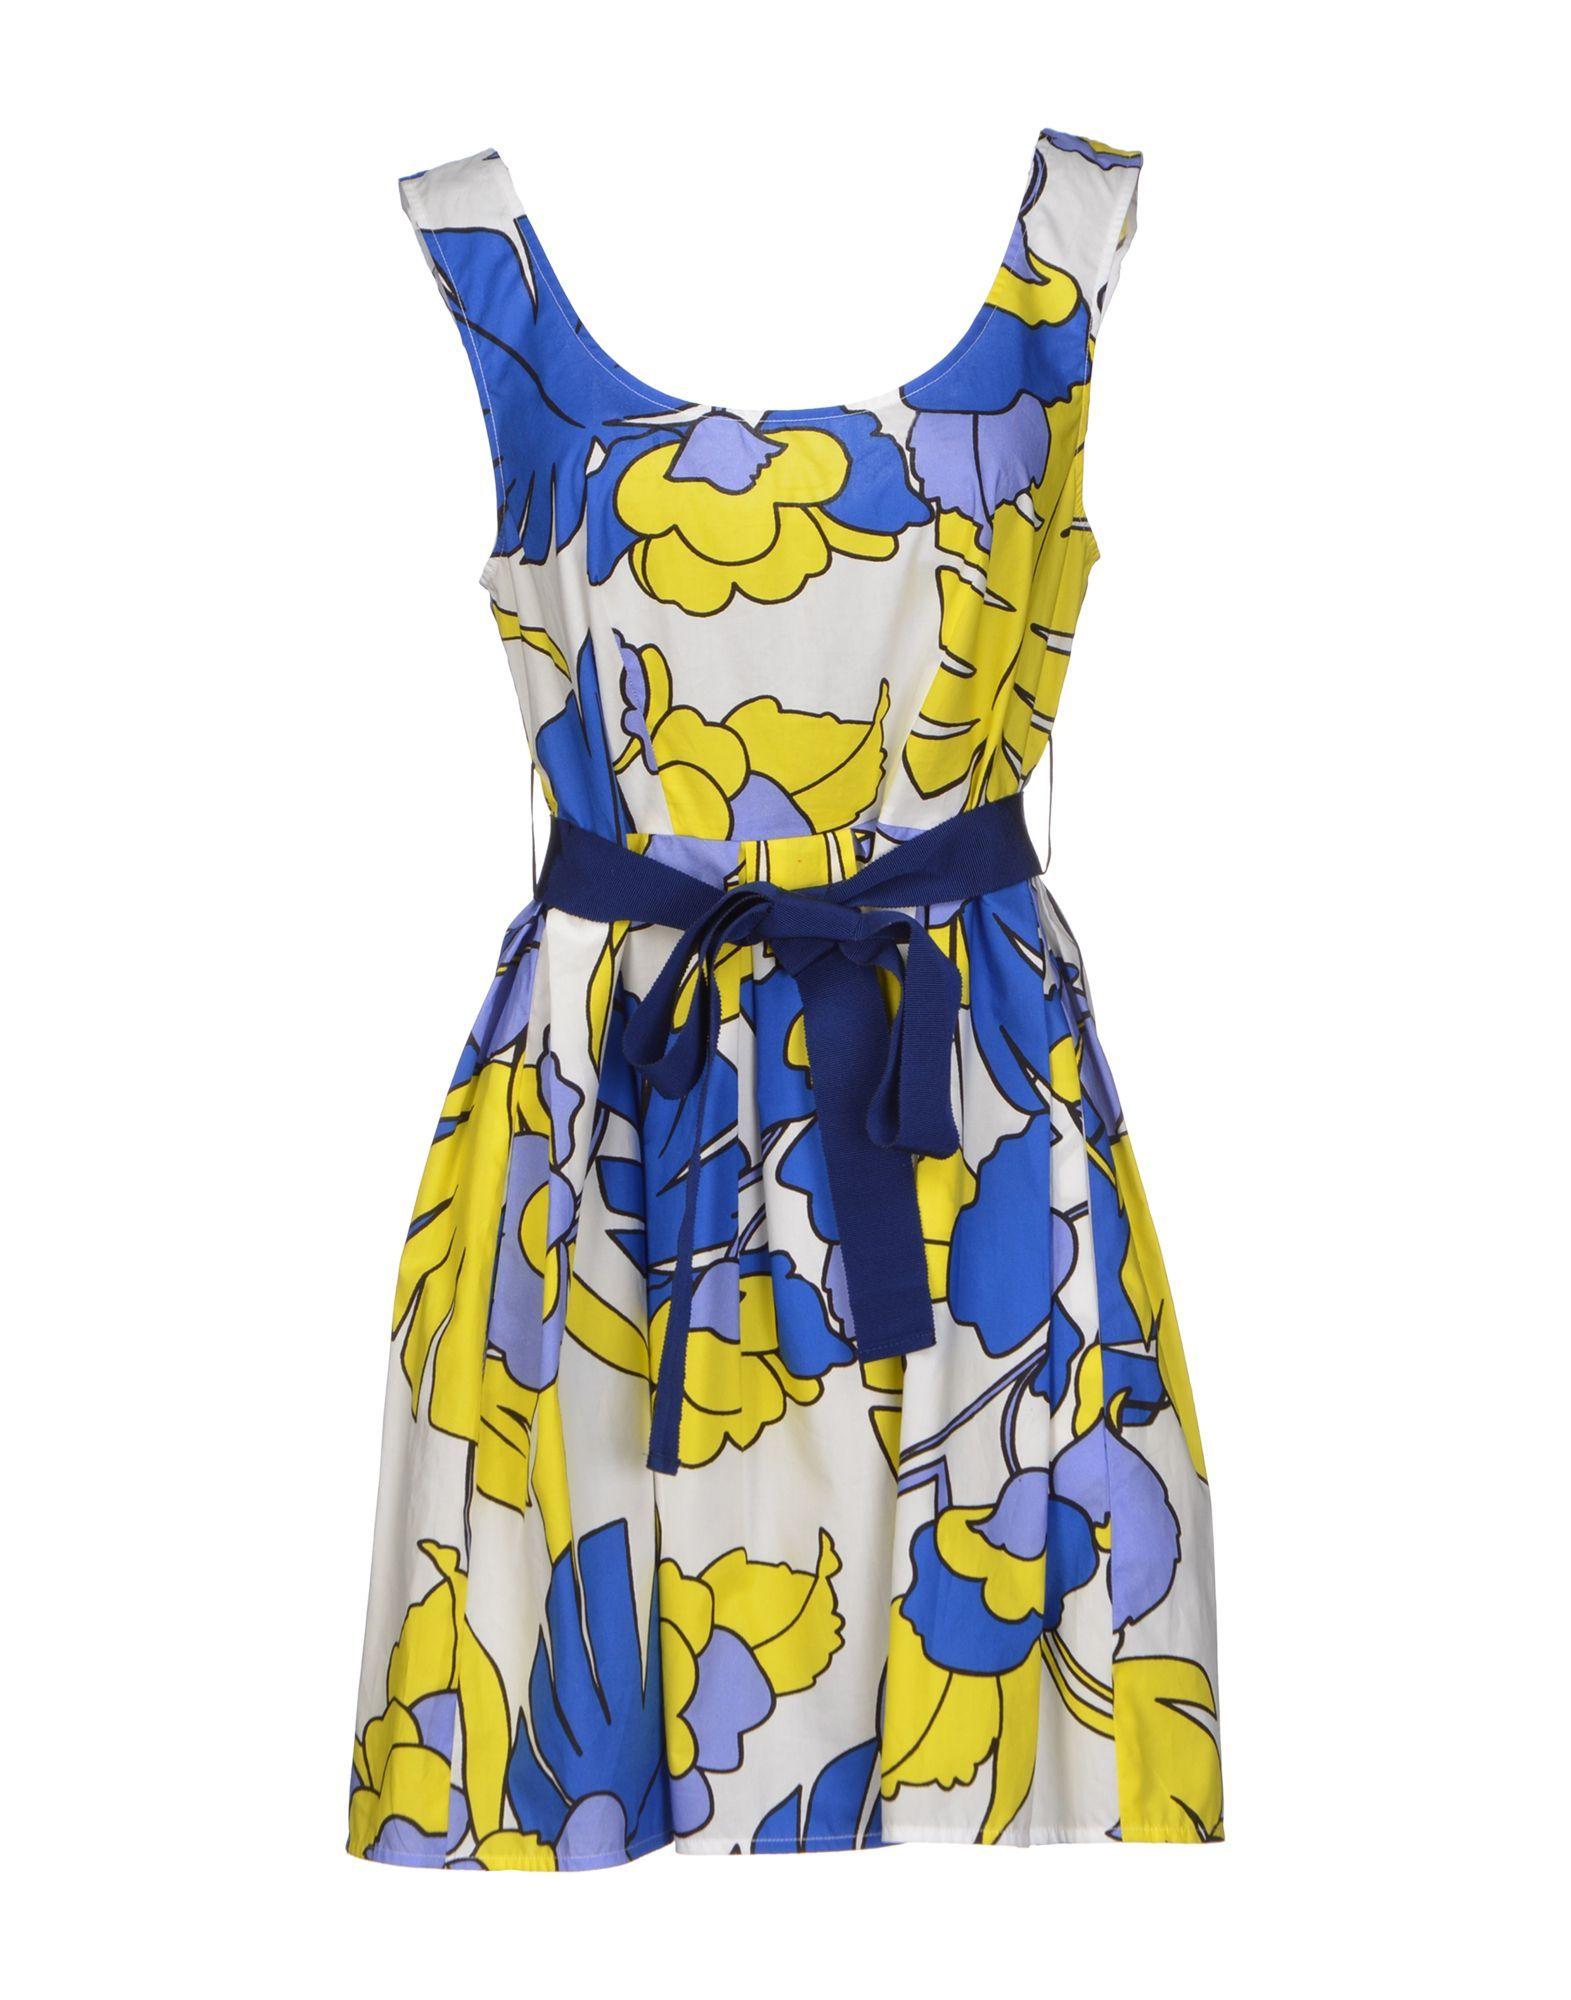 P A R O S H Yellow Short Dress Short Yellow Dress Yellow Shorts Royal Blue And Gold [ 2000 x 1571 Pixel ]